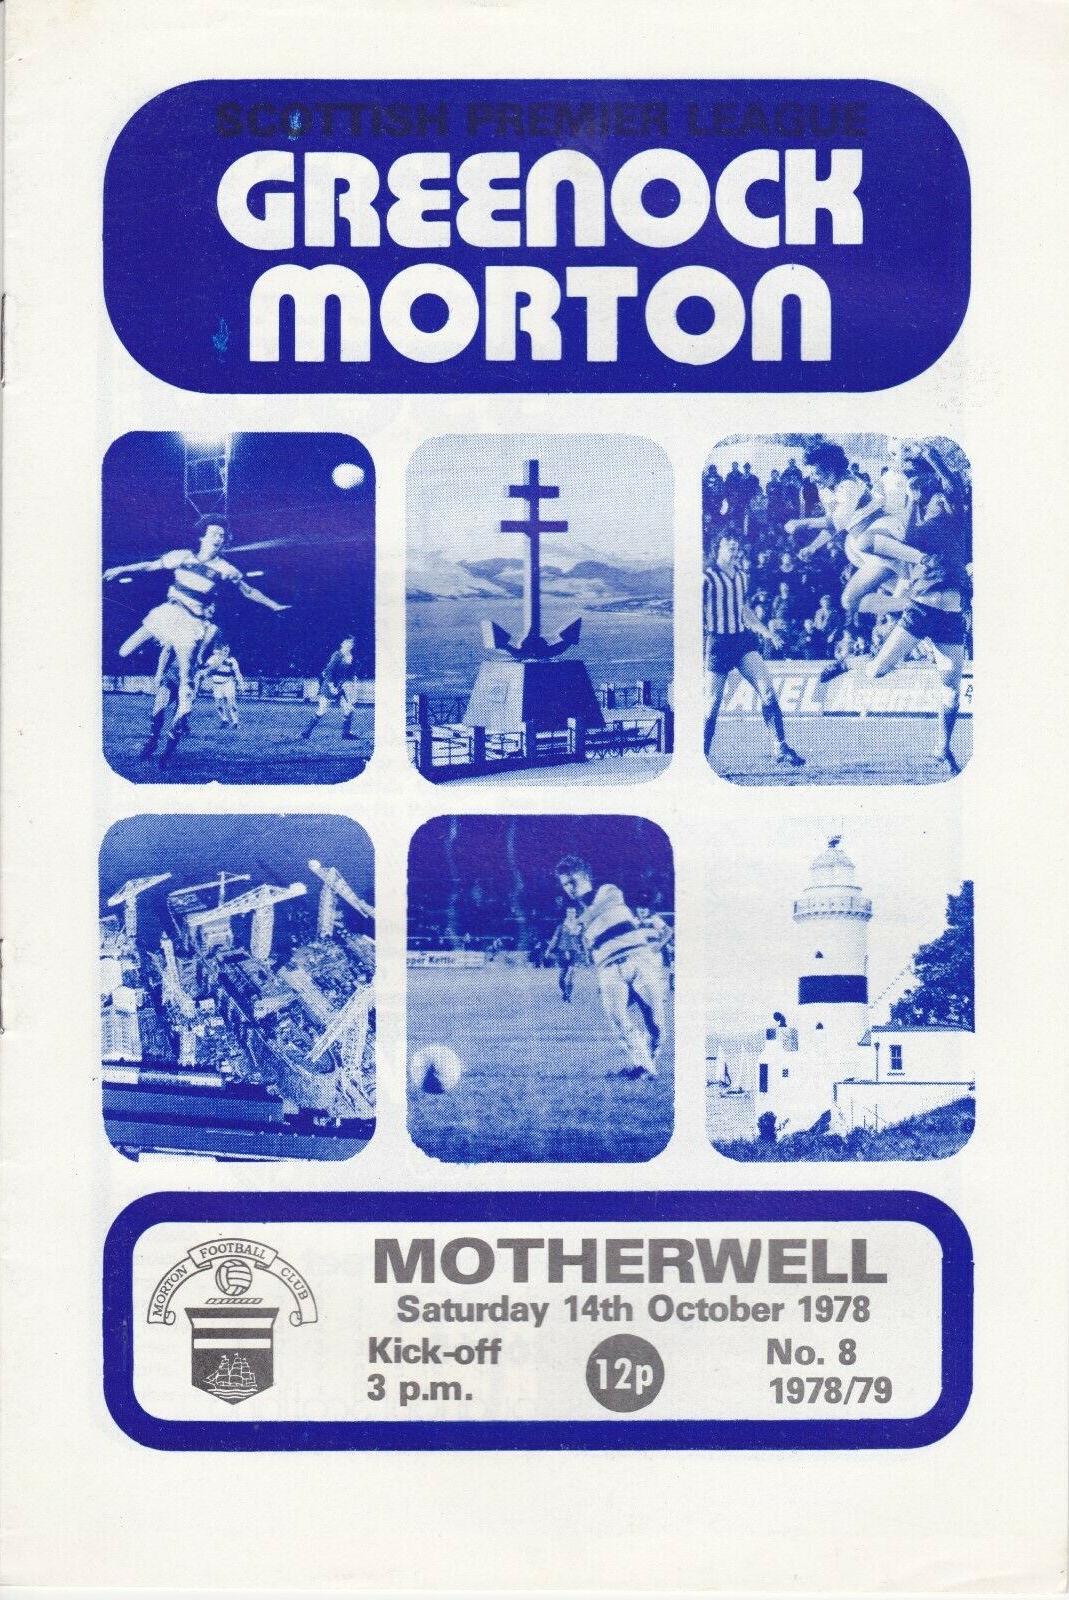 versus Morton Programme Cover